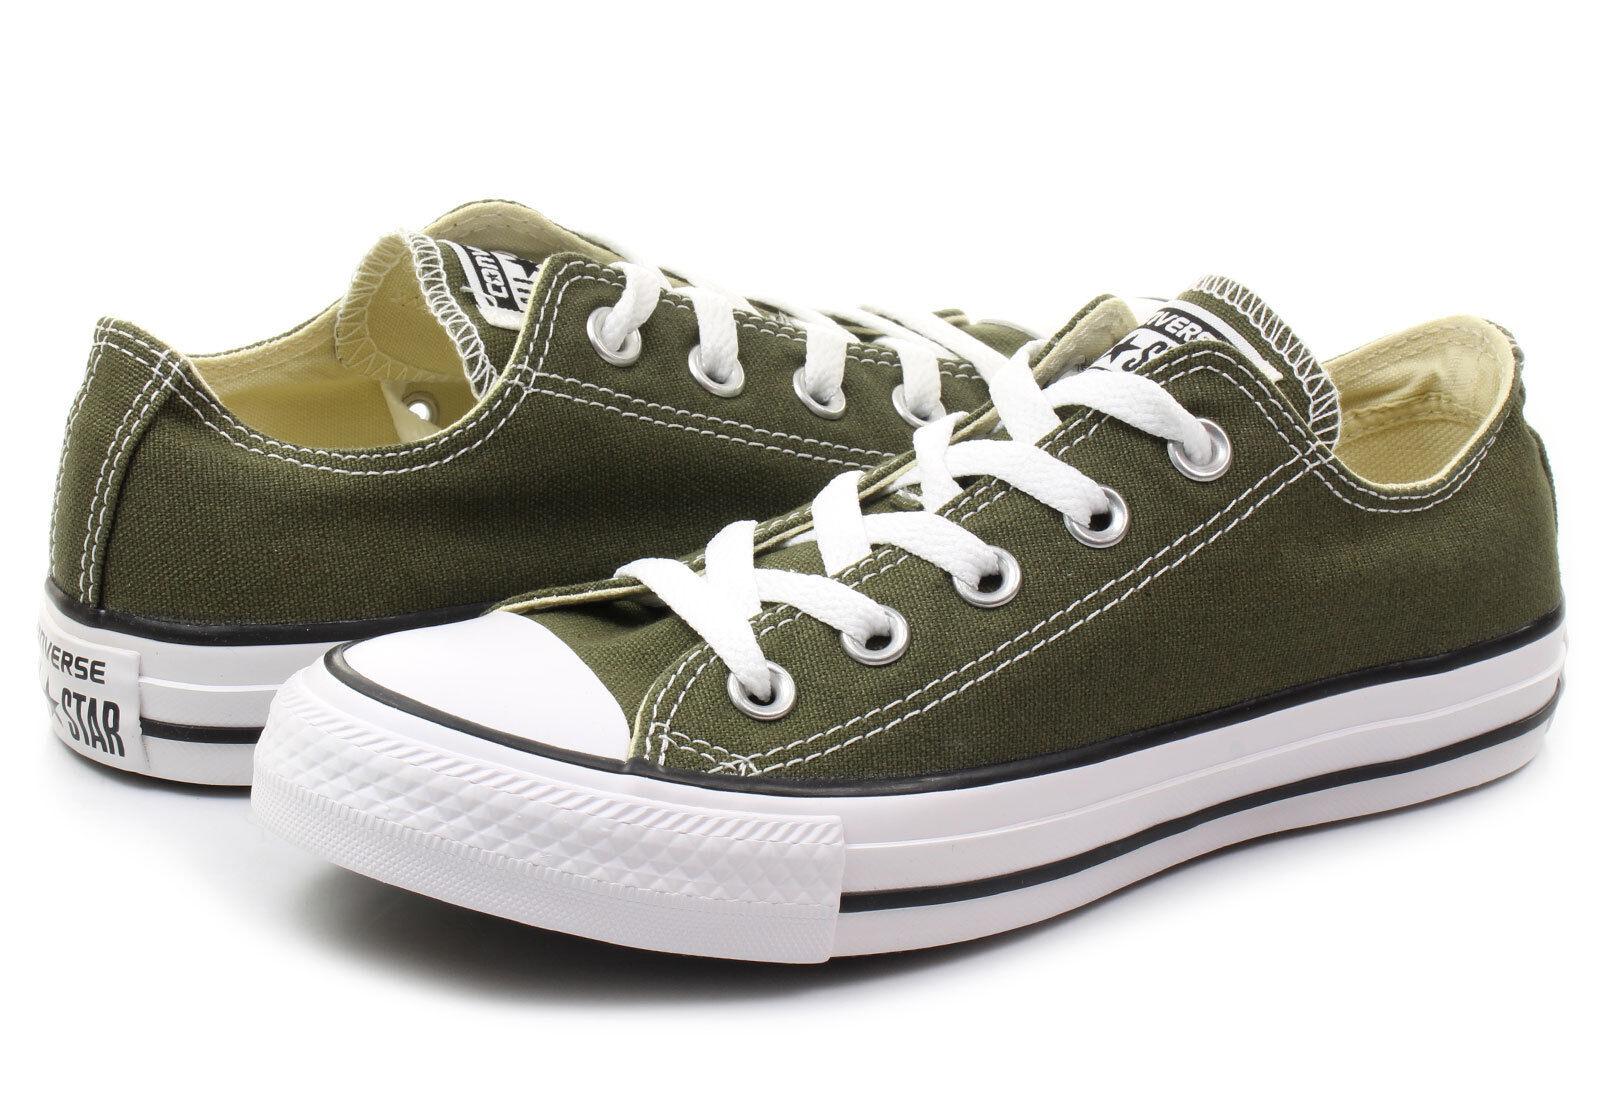 Chuck Taylor All Star Converse Ct OX Herbal Unisex scarpe da ginnastica 151184F